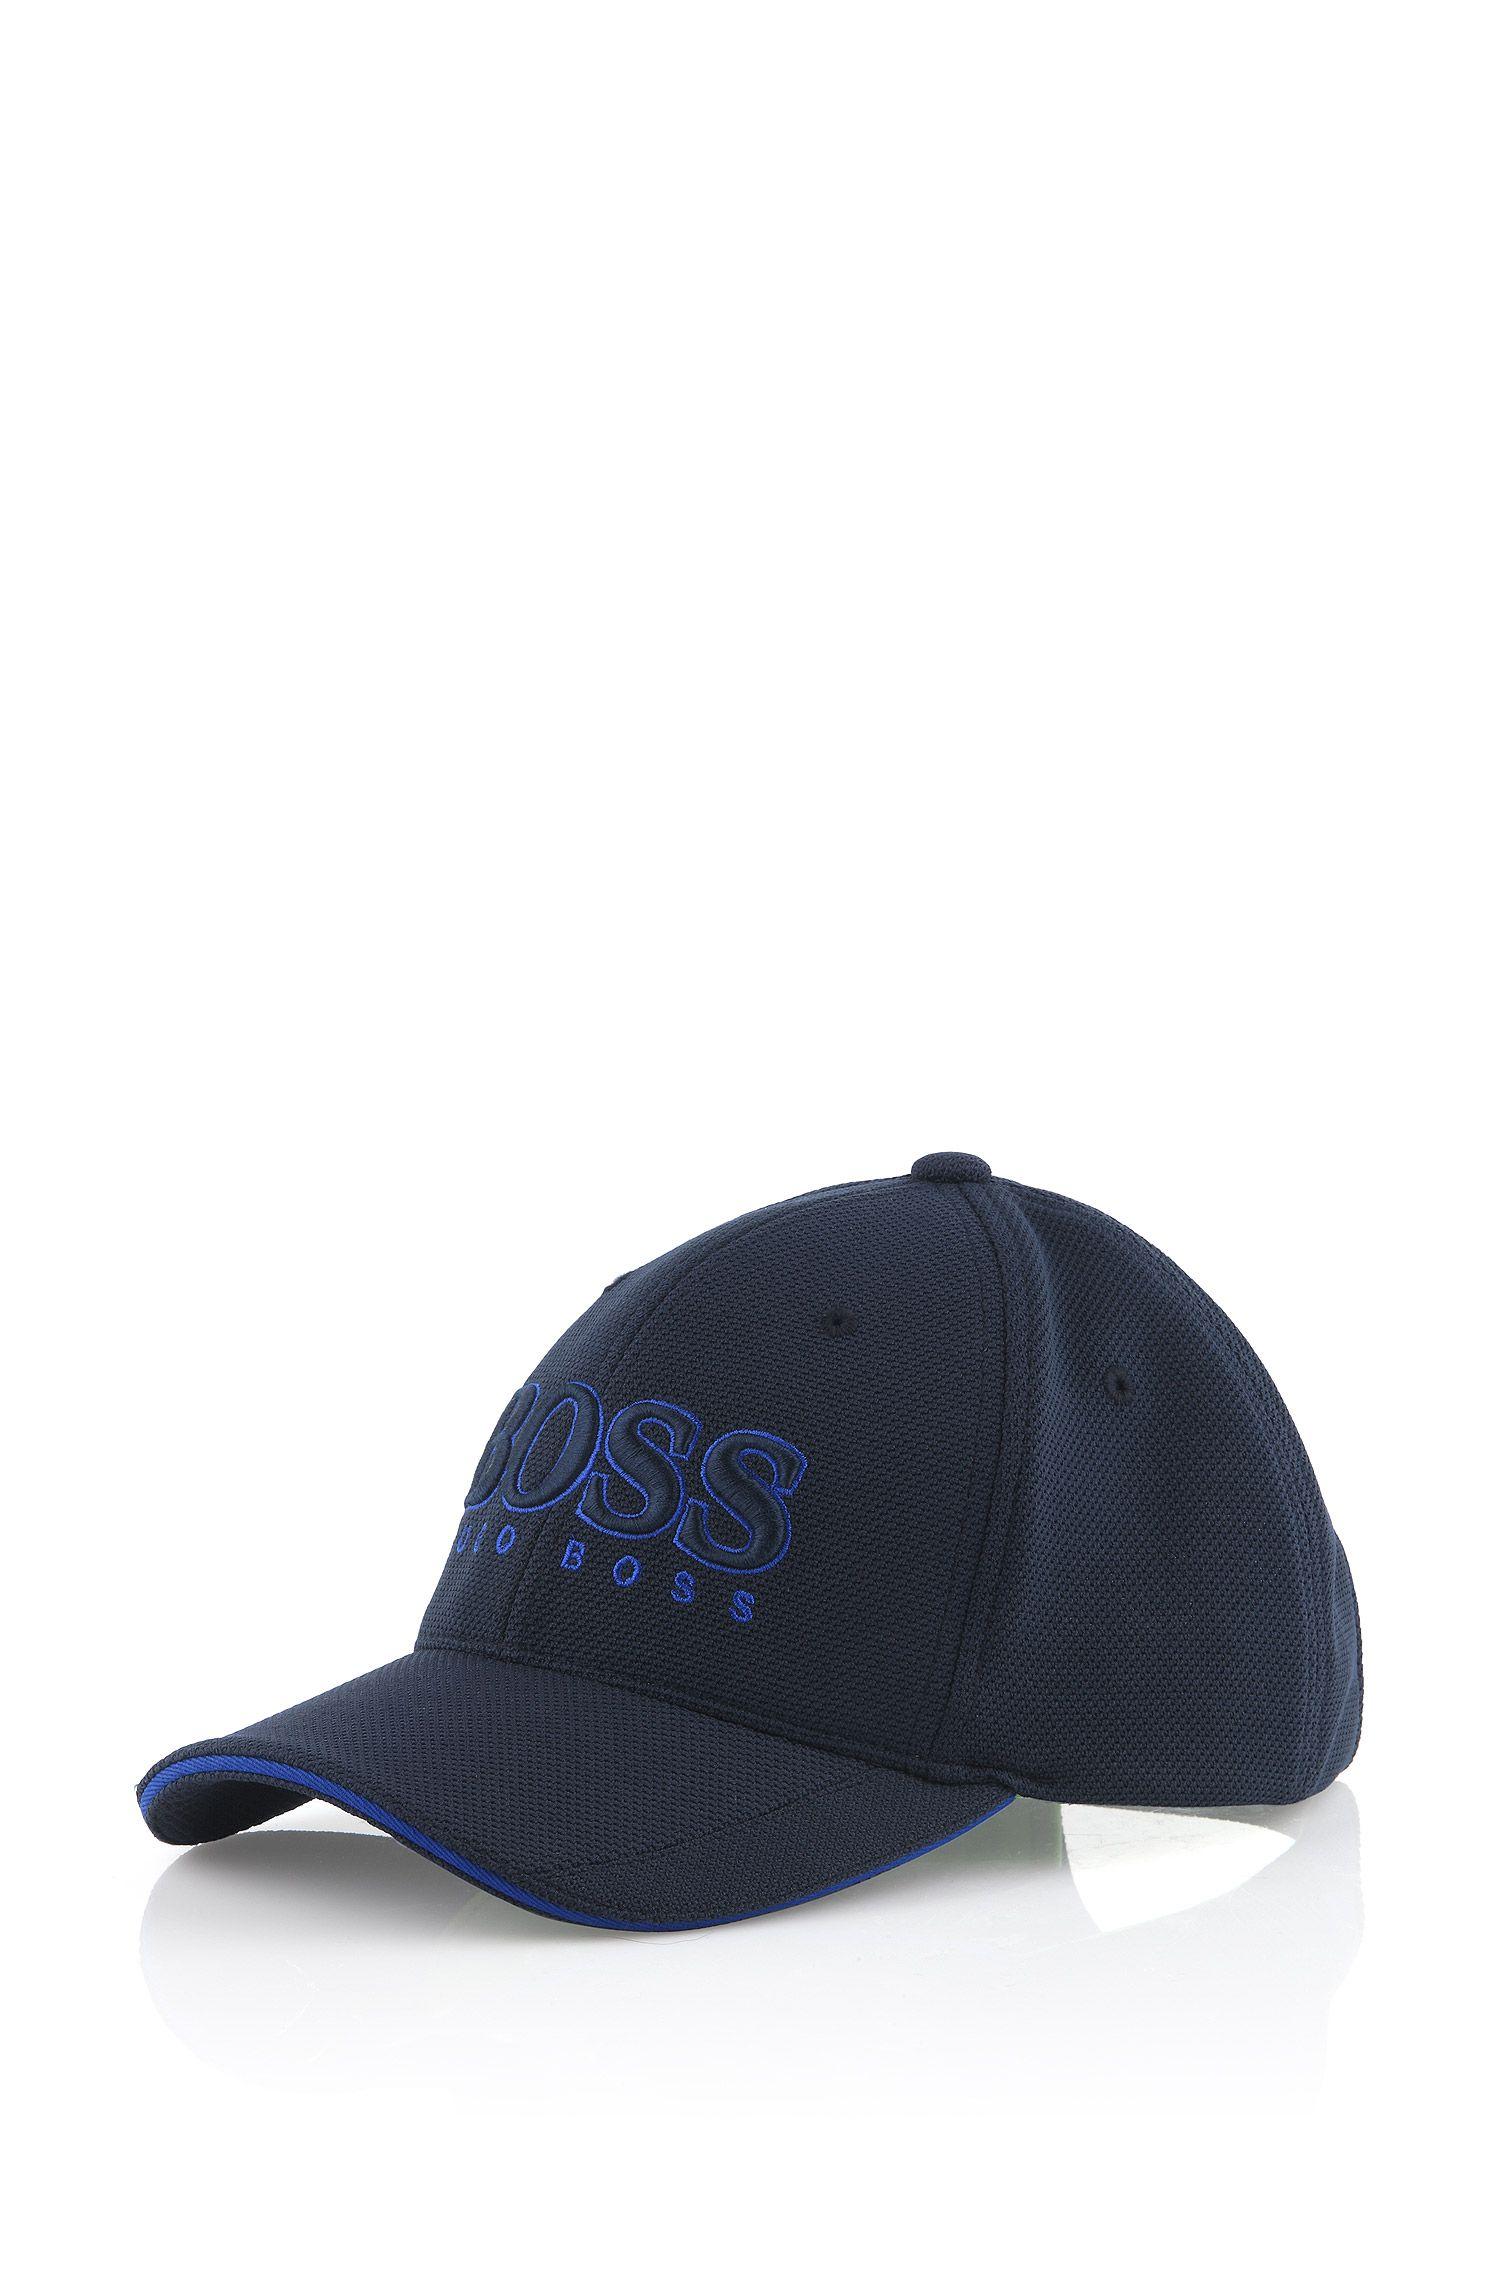 Pet 'Cap US' met groot logostiksel